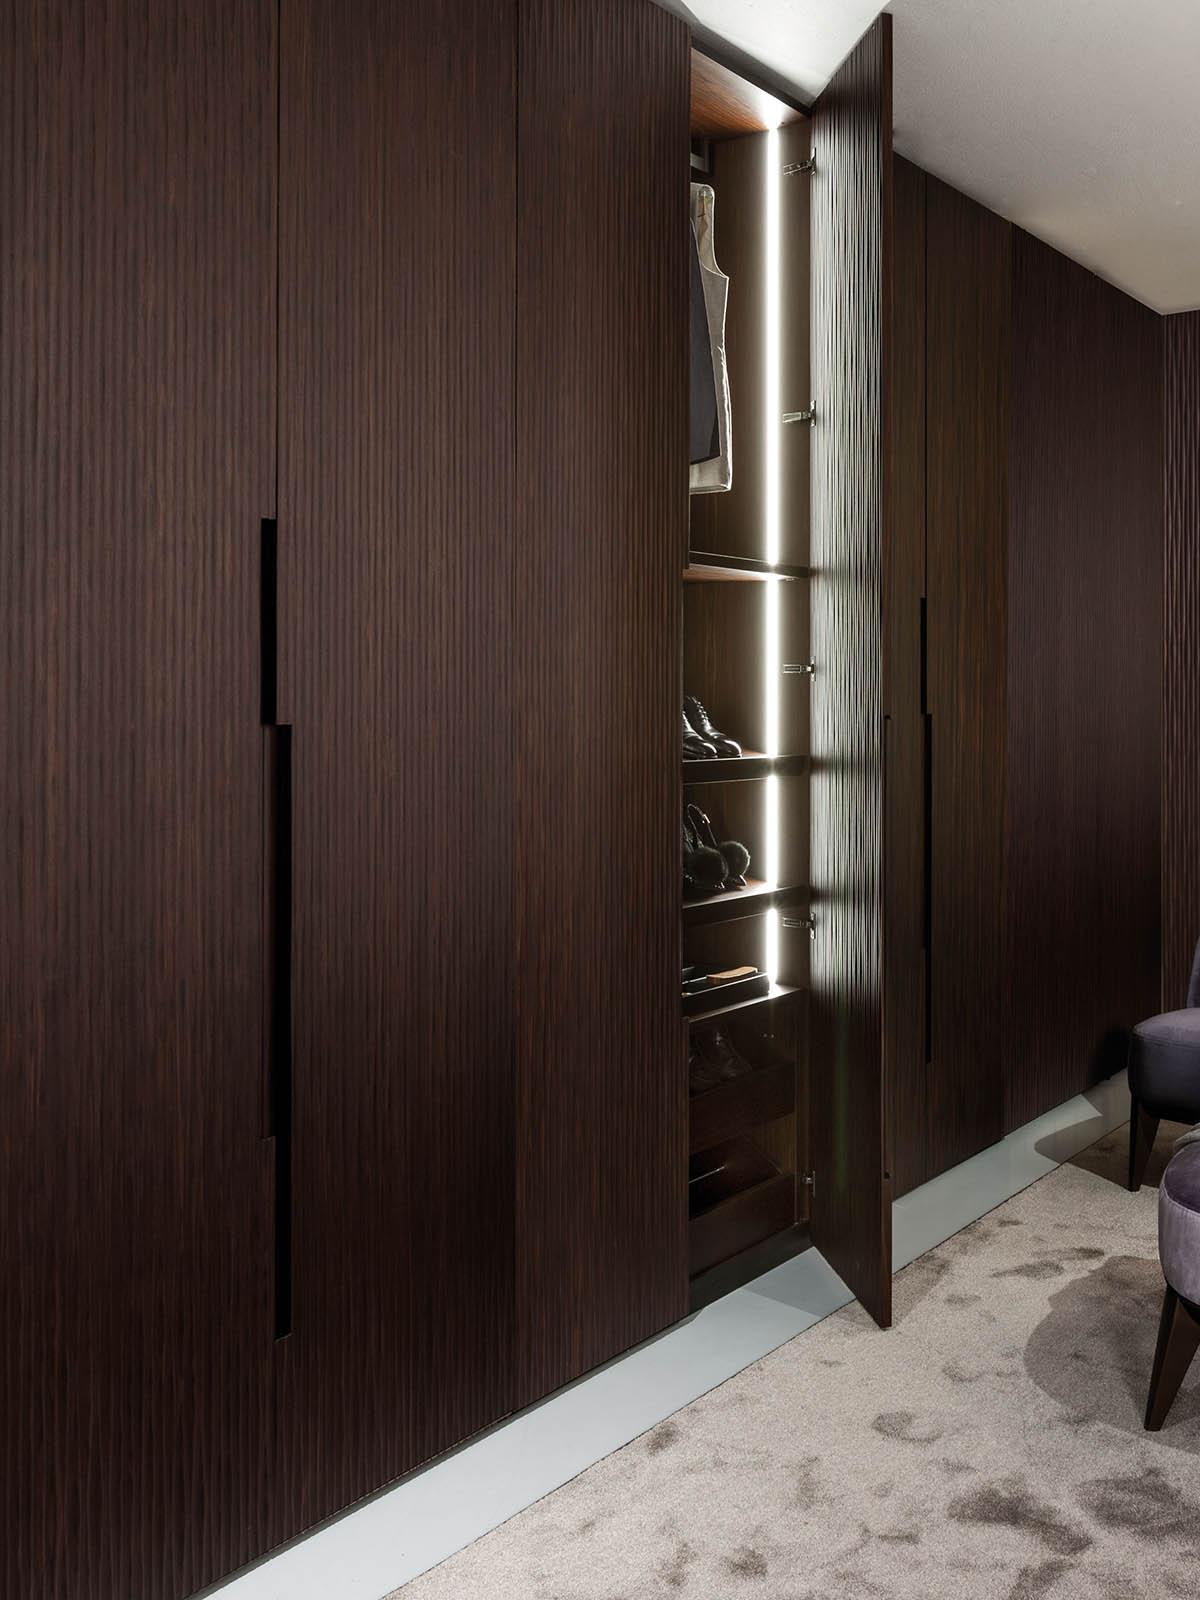 Onda Custom Made Wooden Wardrobe With Textured Hinged Doors Laurameroni Made In Italy